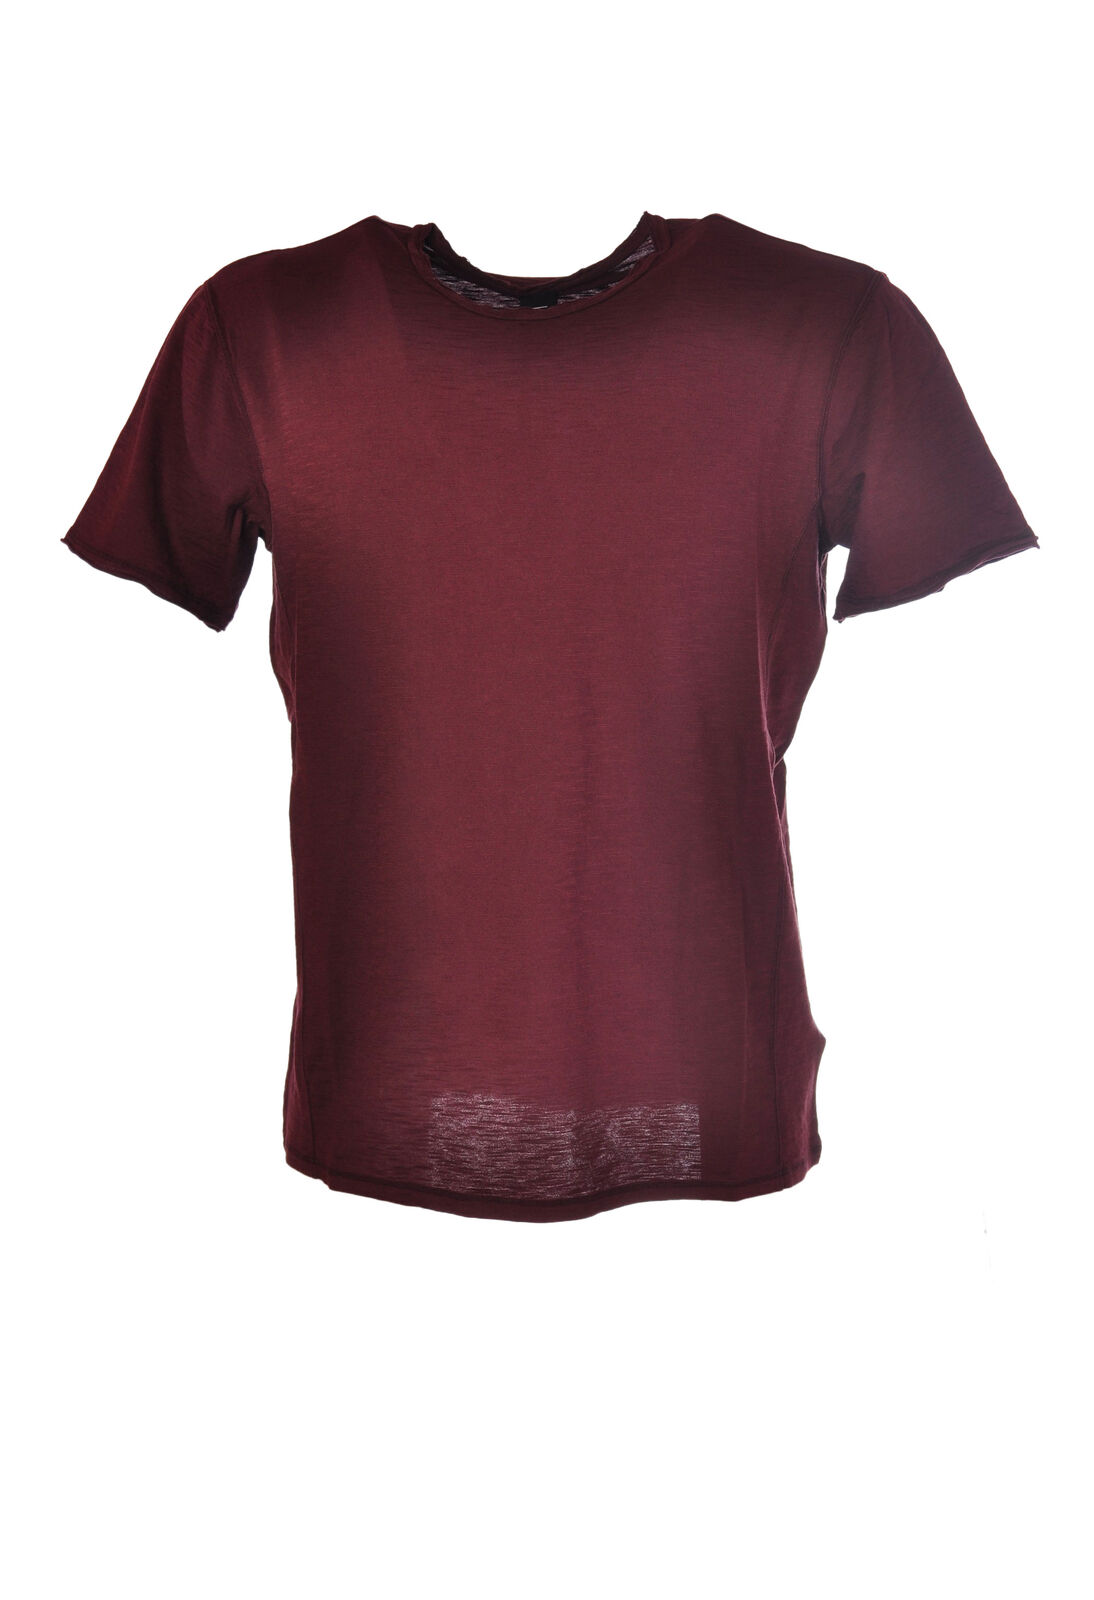 Hosio - Topwear-T-shirts - Mann - brown - 2781803N184503